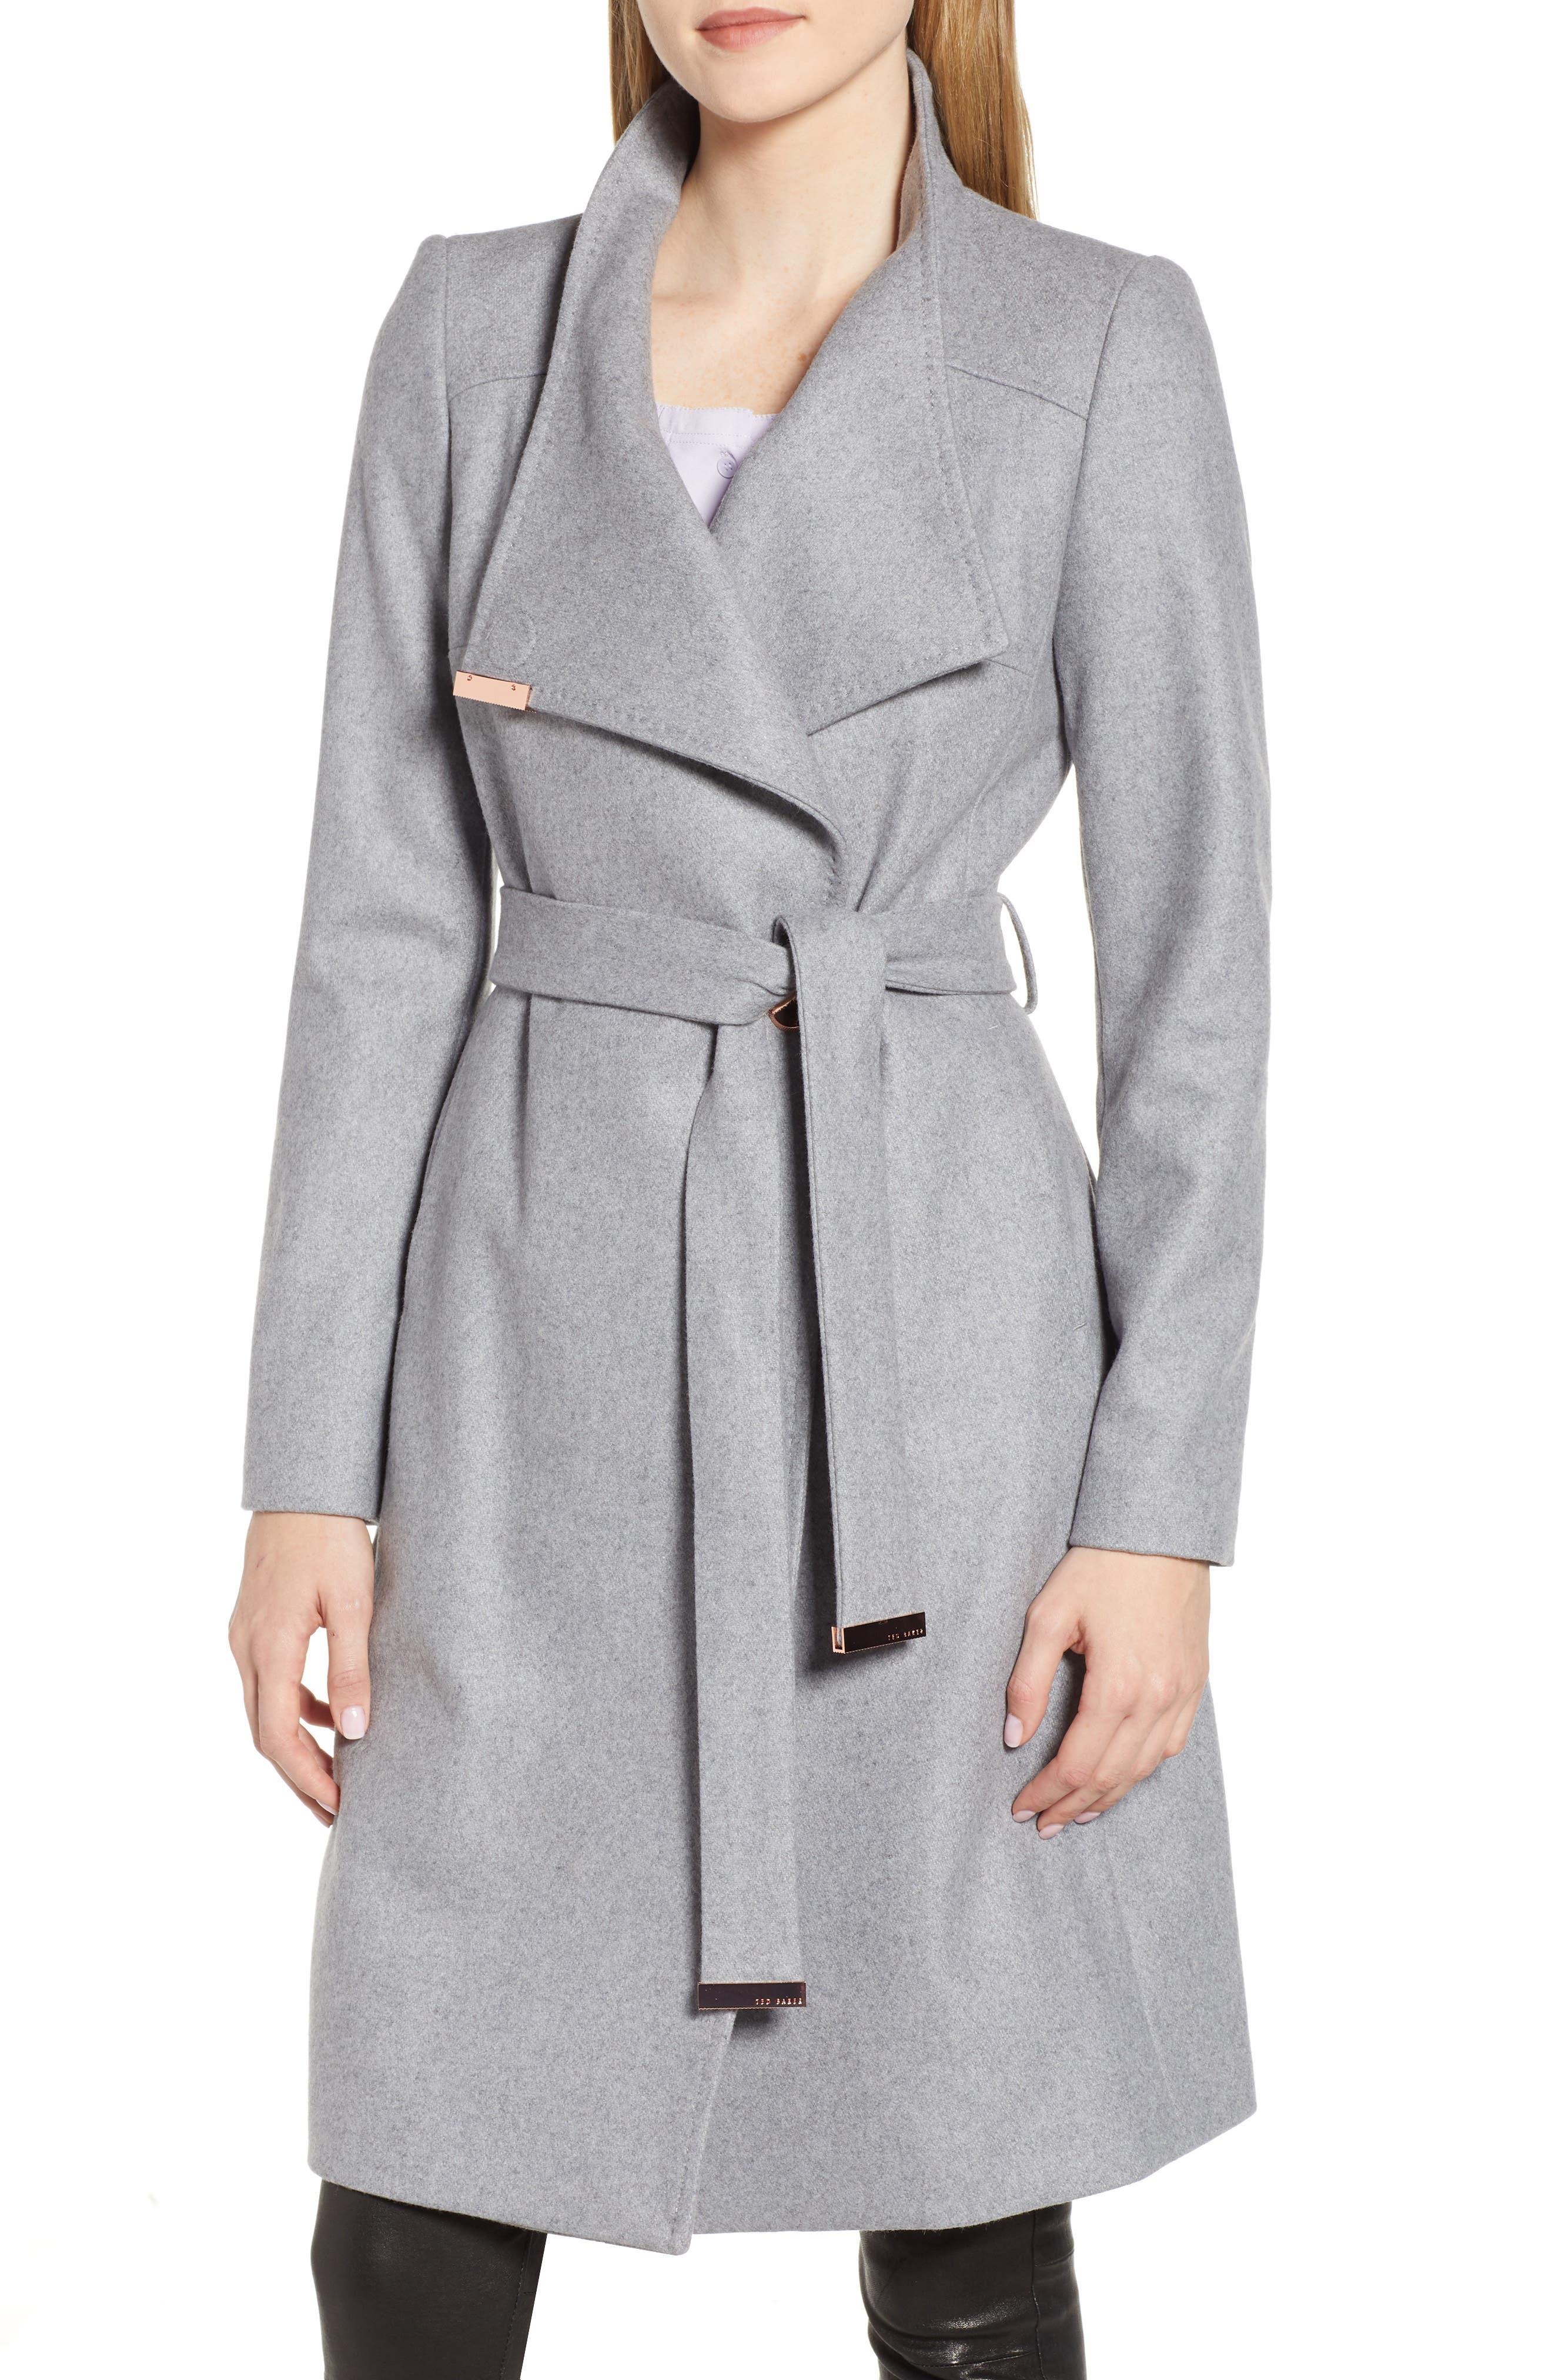 TED BAKER LONDON, Wool Blend Long Wrap Coat, Main thumbnail 1, color, 030